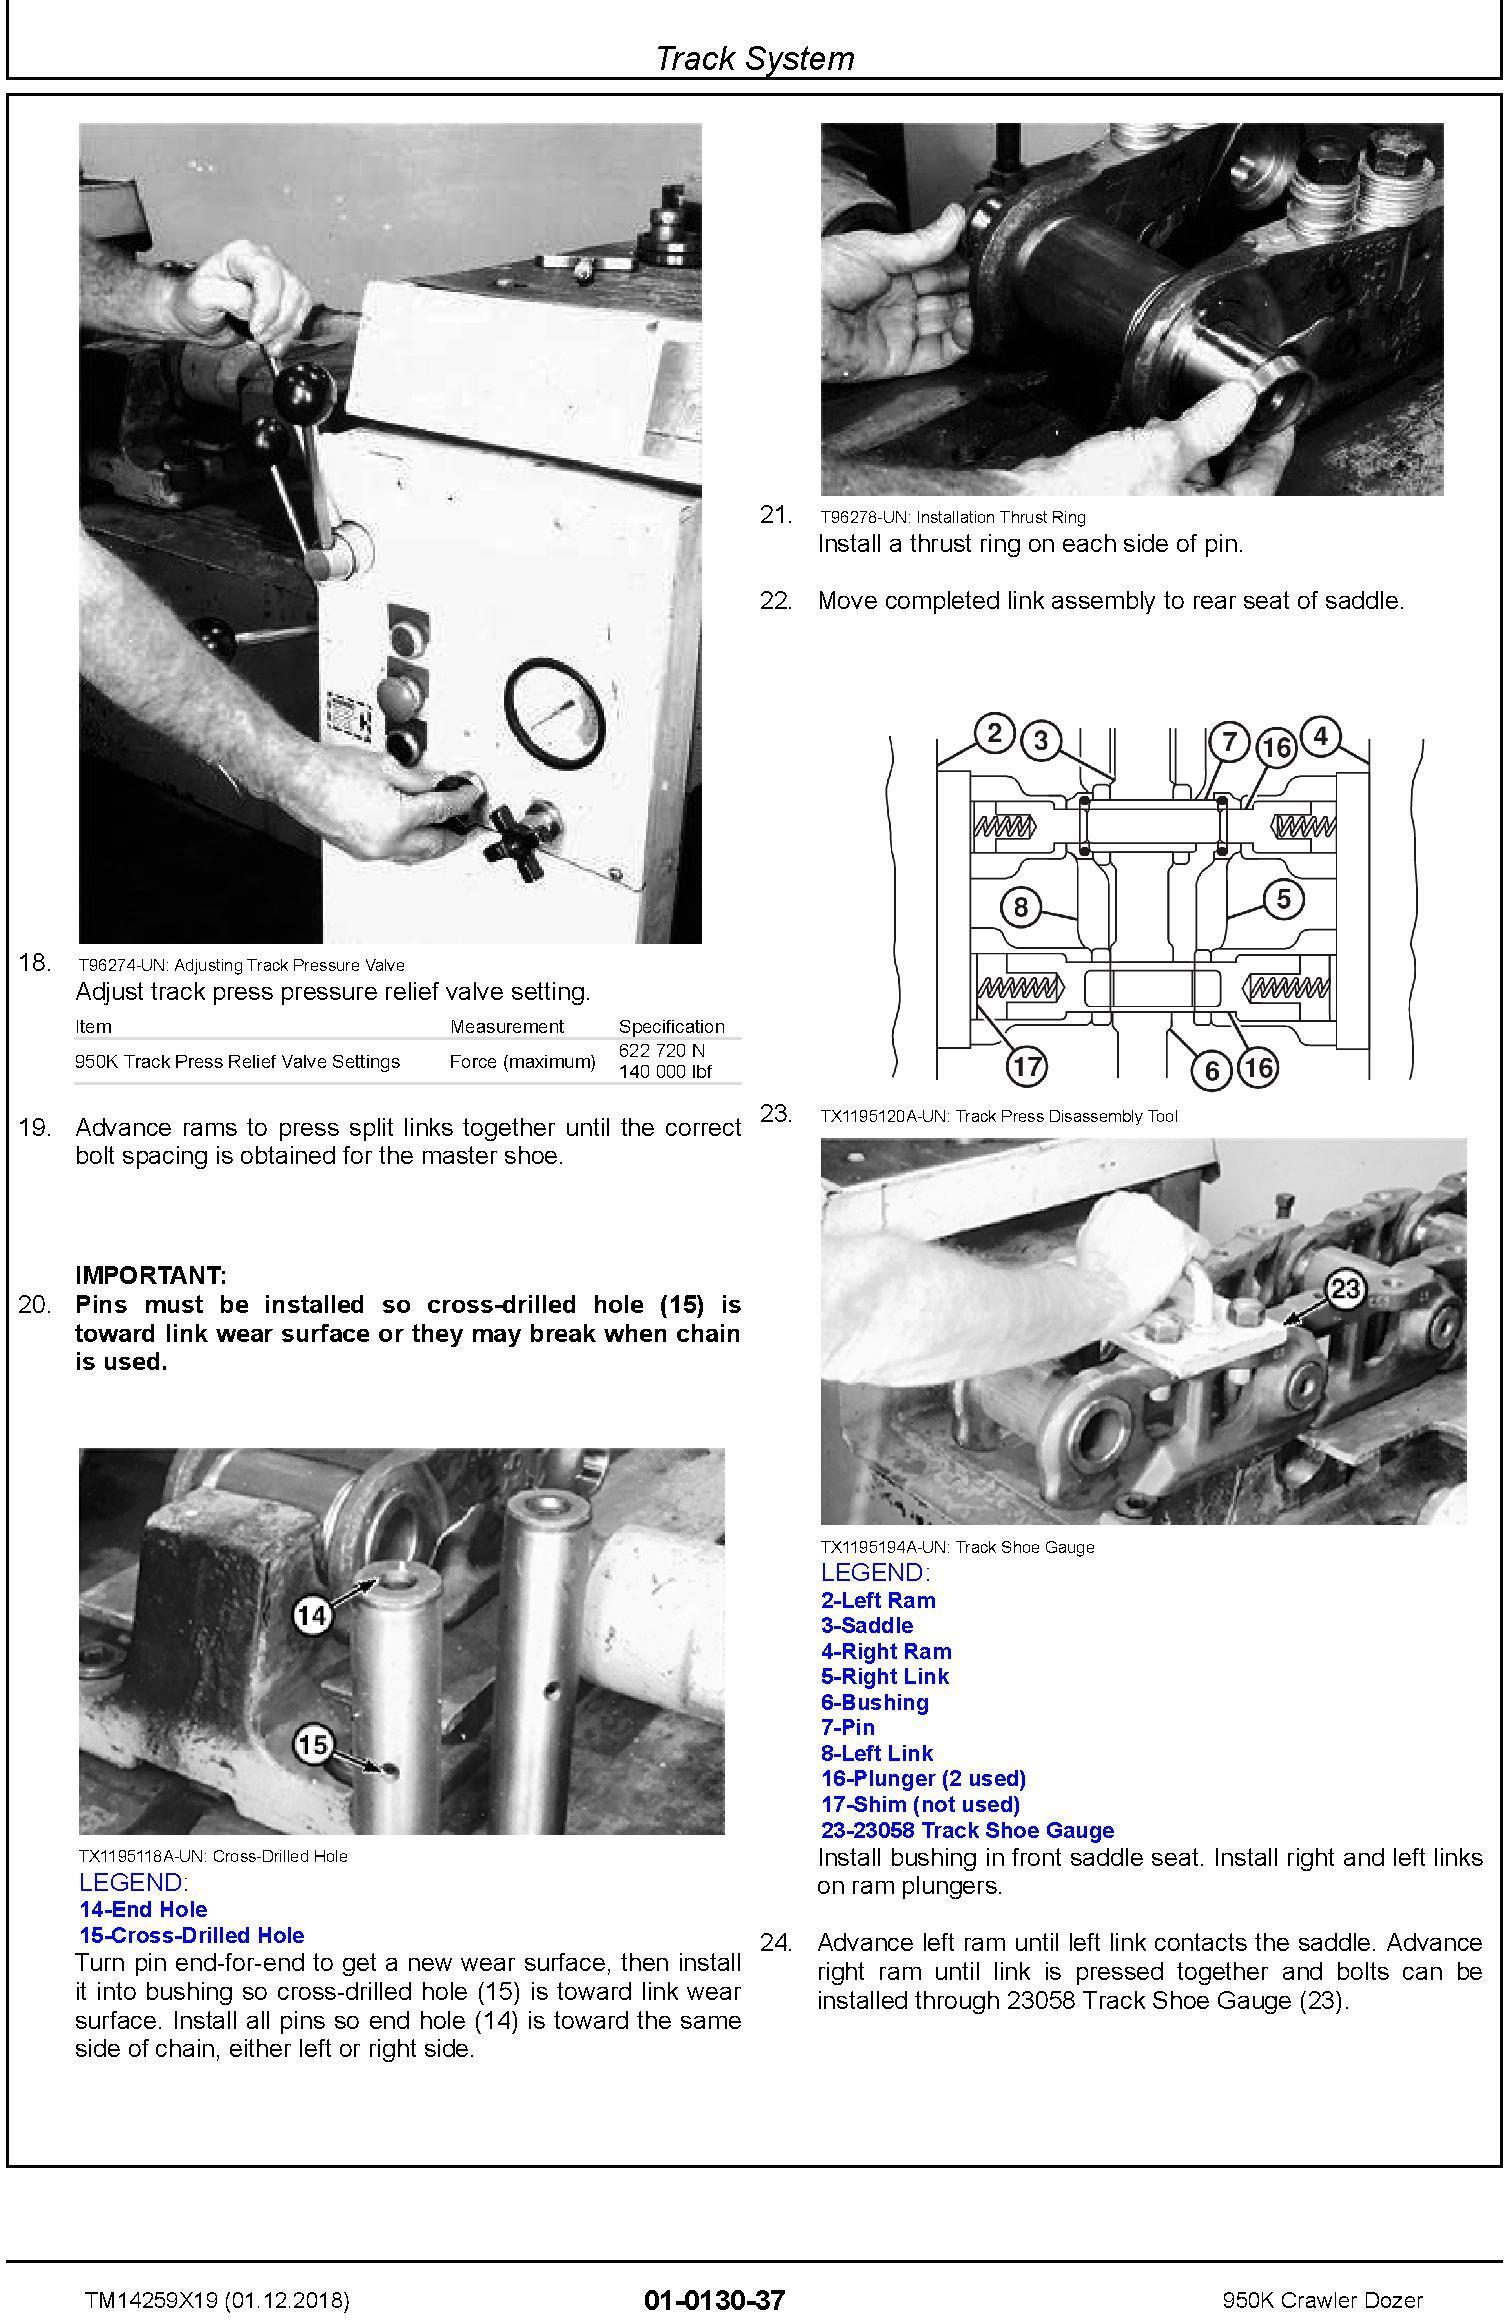 John Deere 950K (SN. C310401-338999) Crawler Dozer Repair Technical Service Manual (TM14259X19) - 2